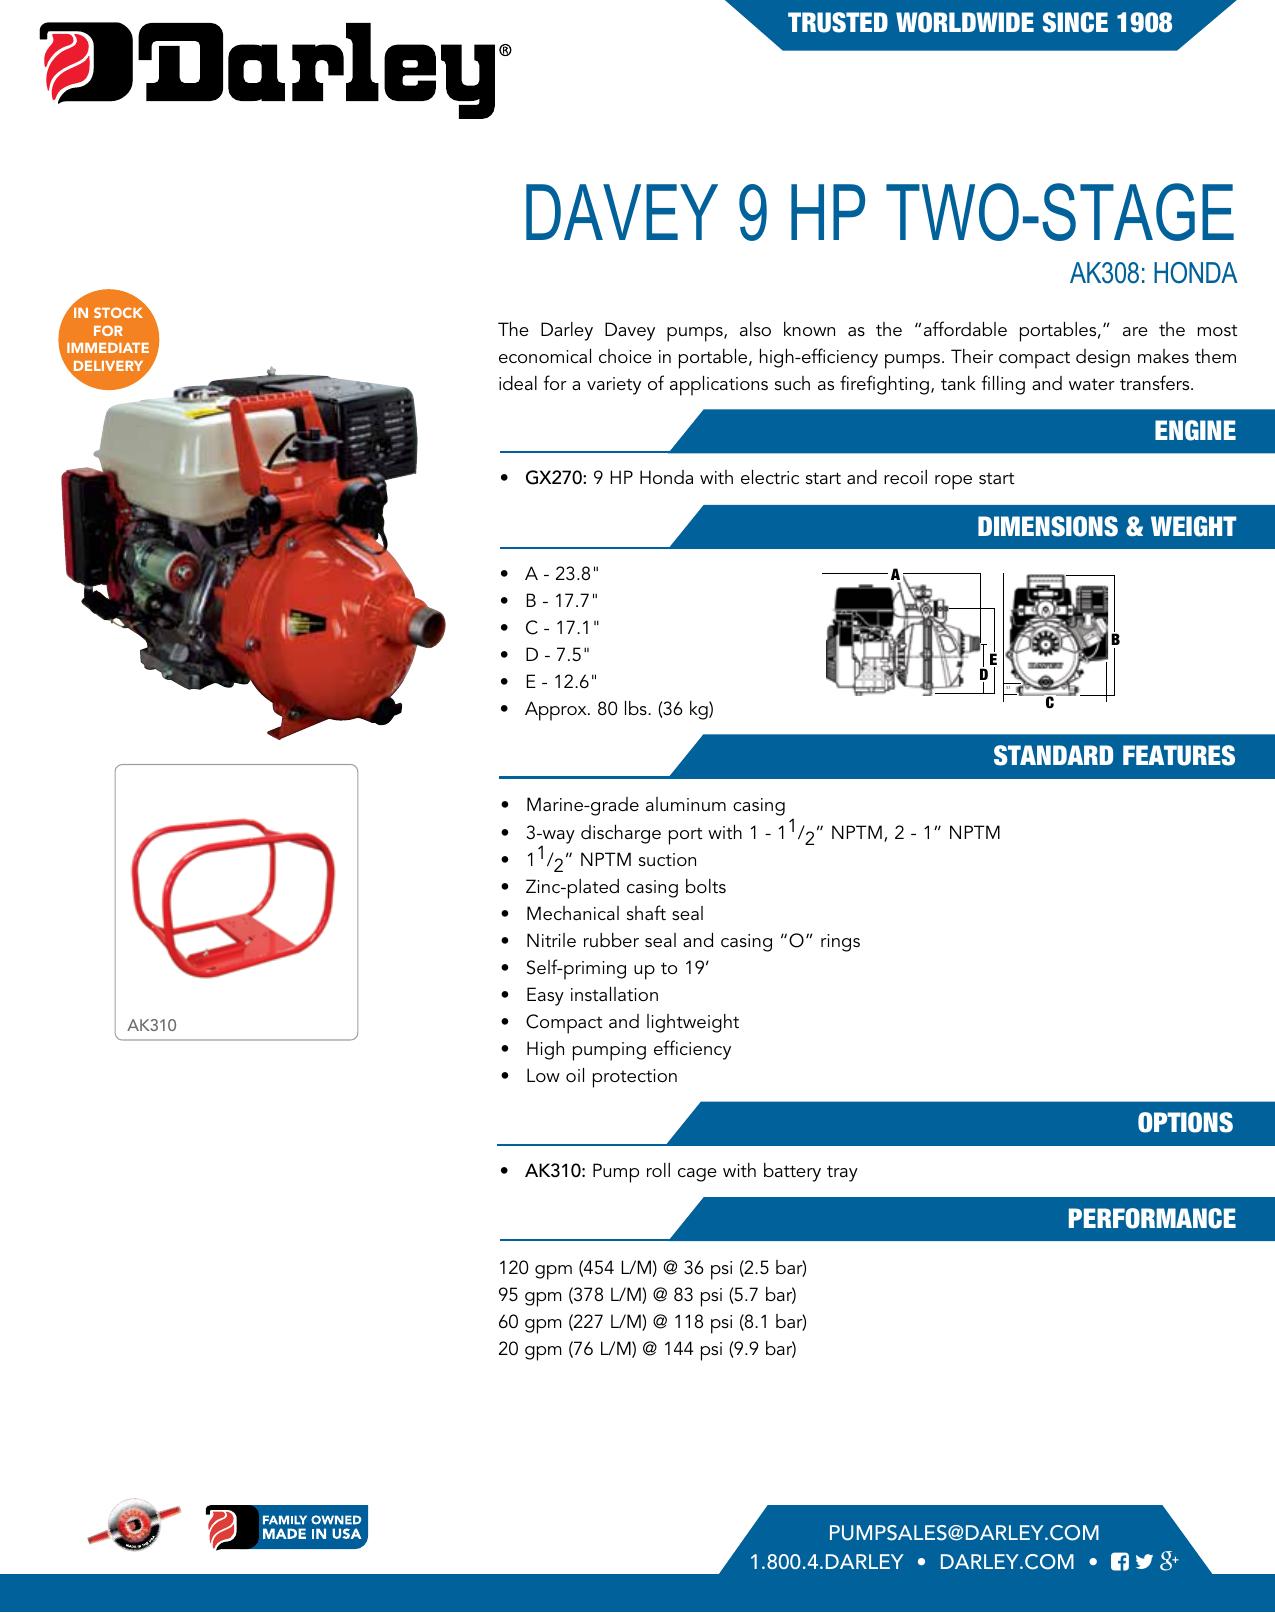 550084 1 Davey 9 HP Portable Pump Honda GX270 Brochure